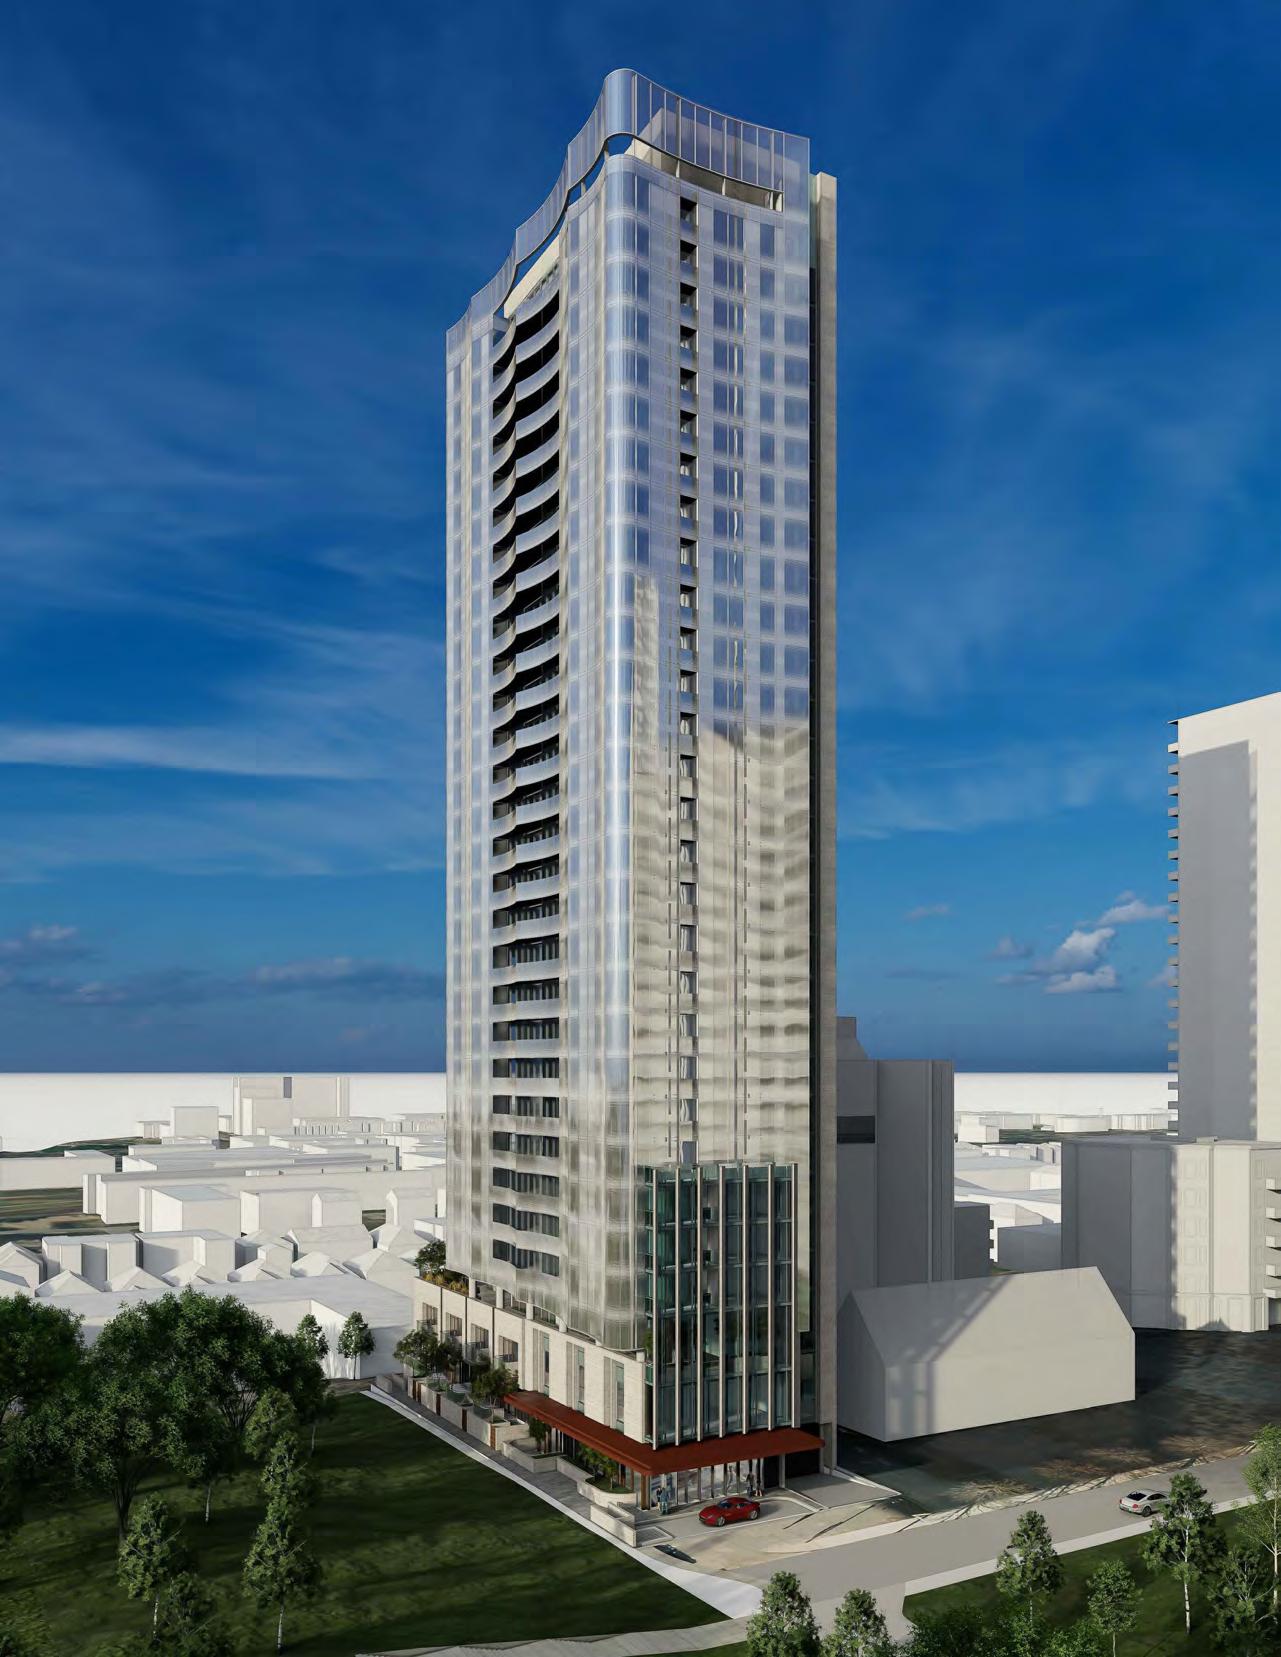 49 Jackes Avenue, Toronto, designed by Hariri Pontarini Architects for Lifetime Developments